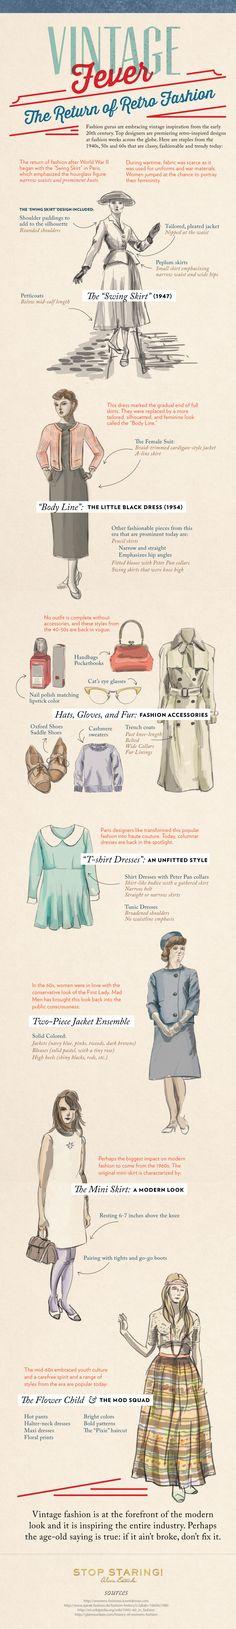 Vintage Fever - The Return of Retro Fashion  Infographic